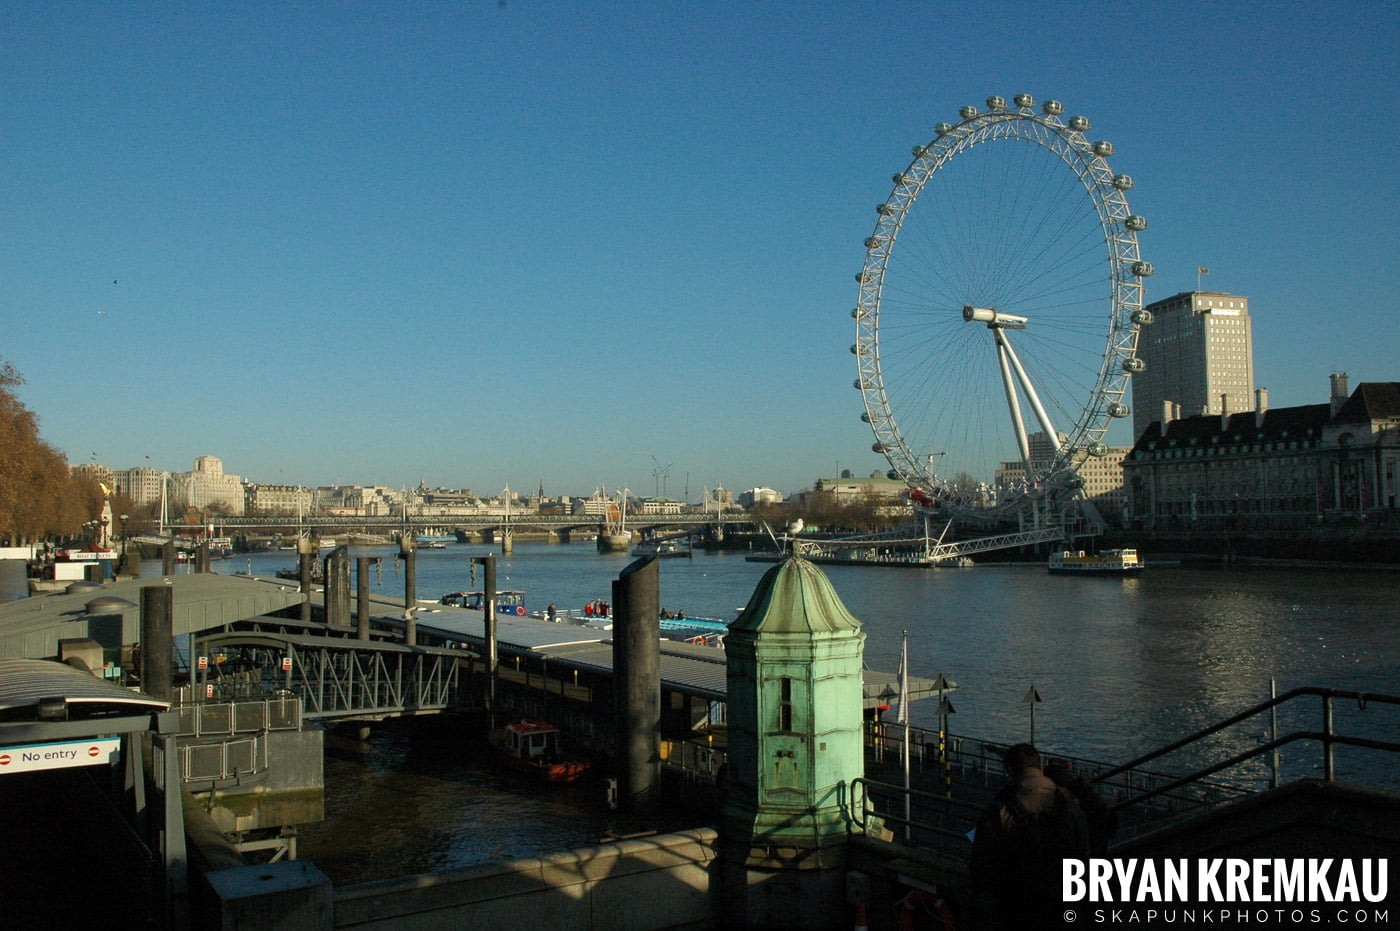 London, England - Day 4 - 12.19.05 (46)